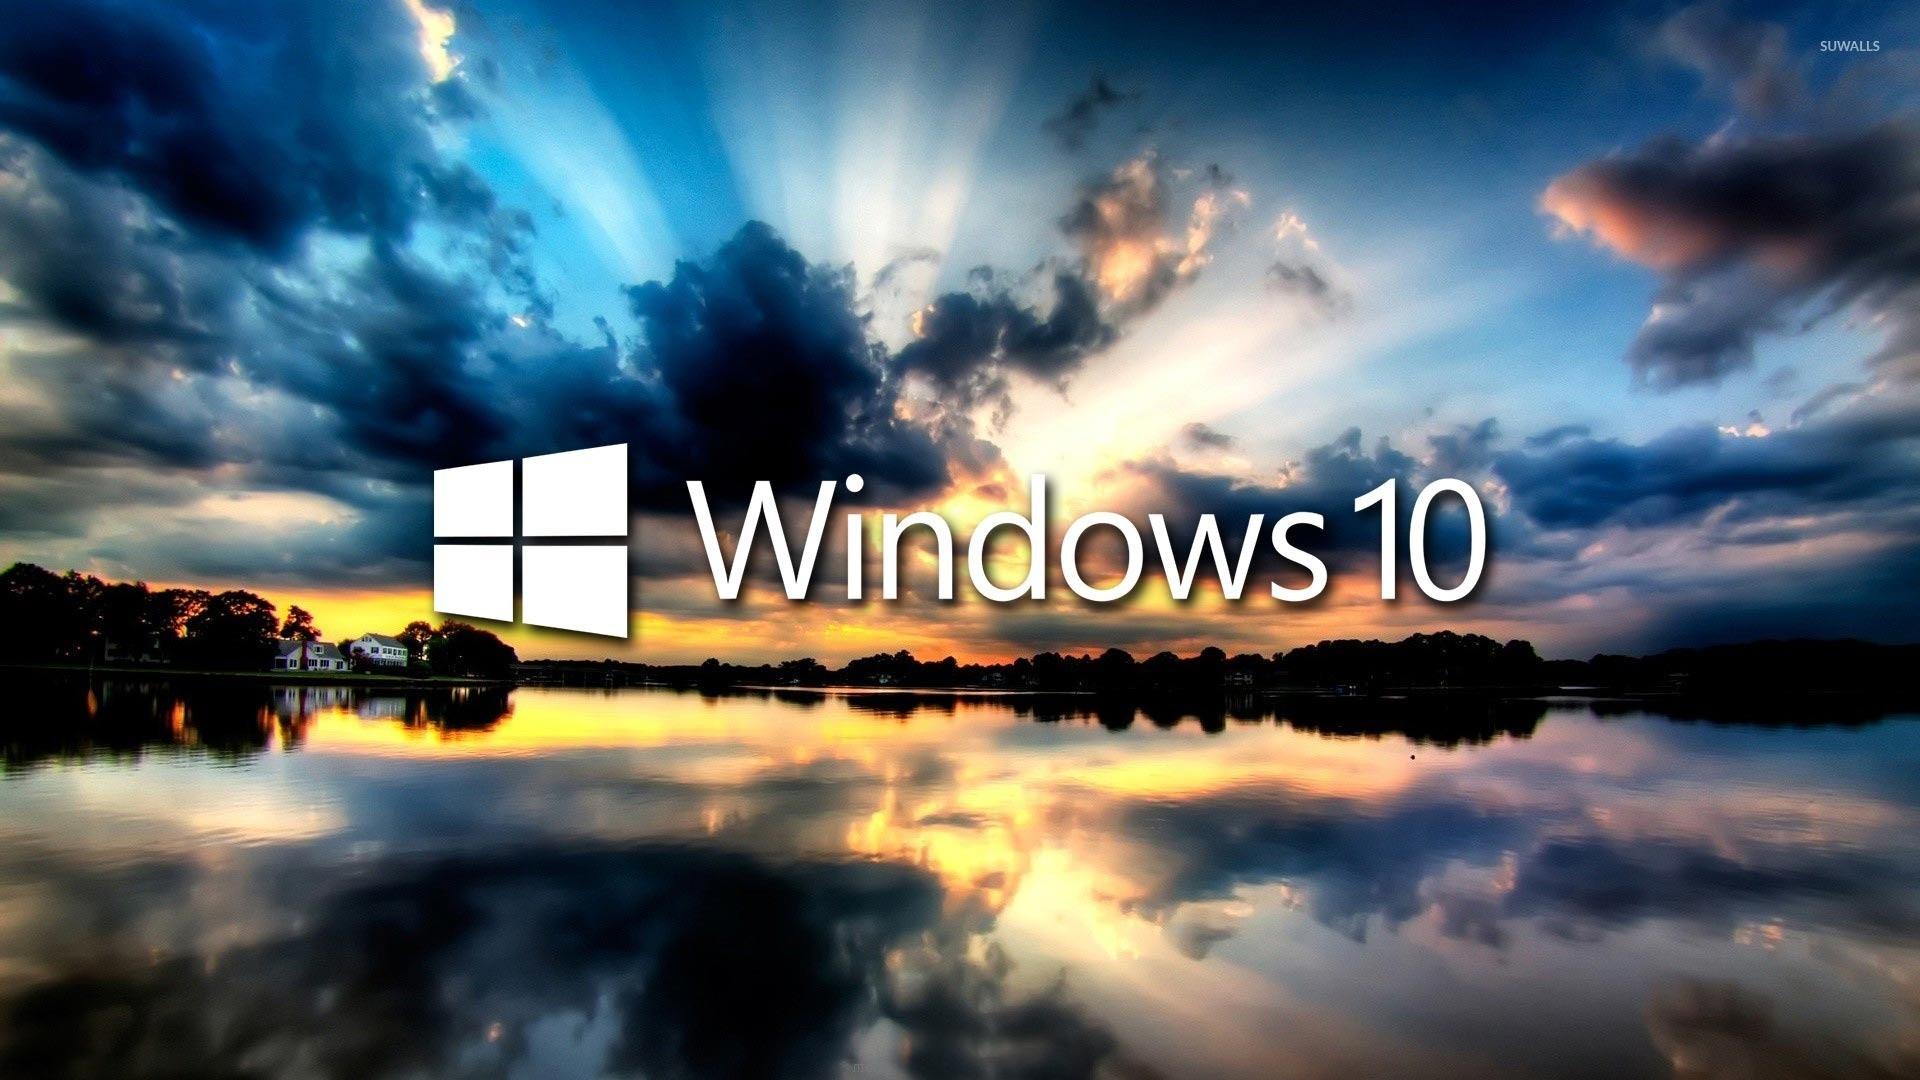 Windows 10 Wallpaper 1920x1080 (75+ images)